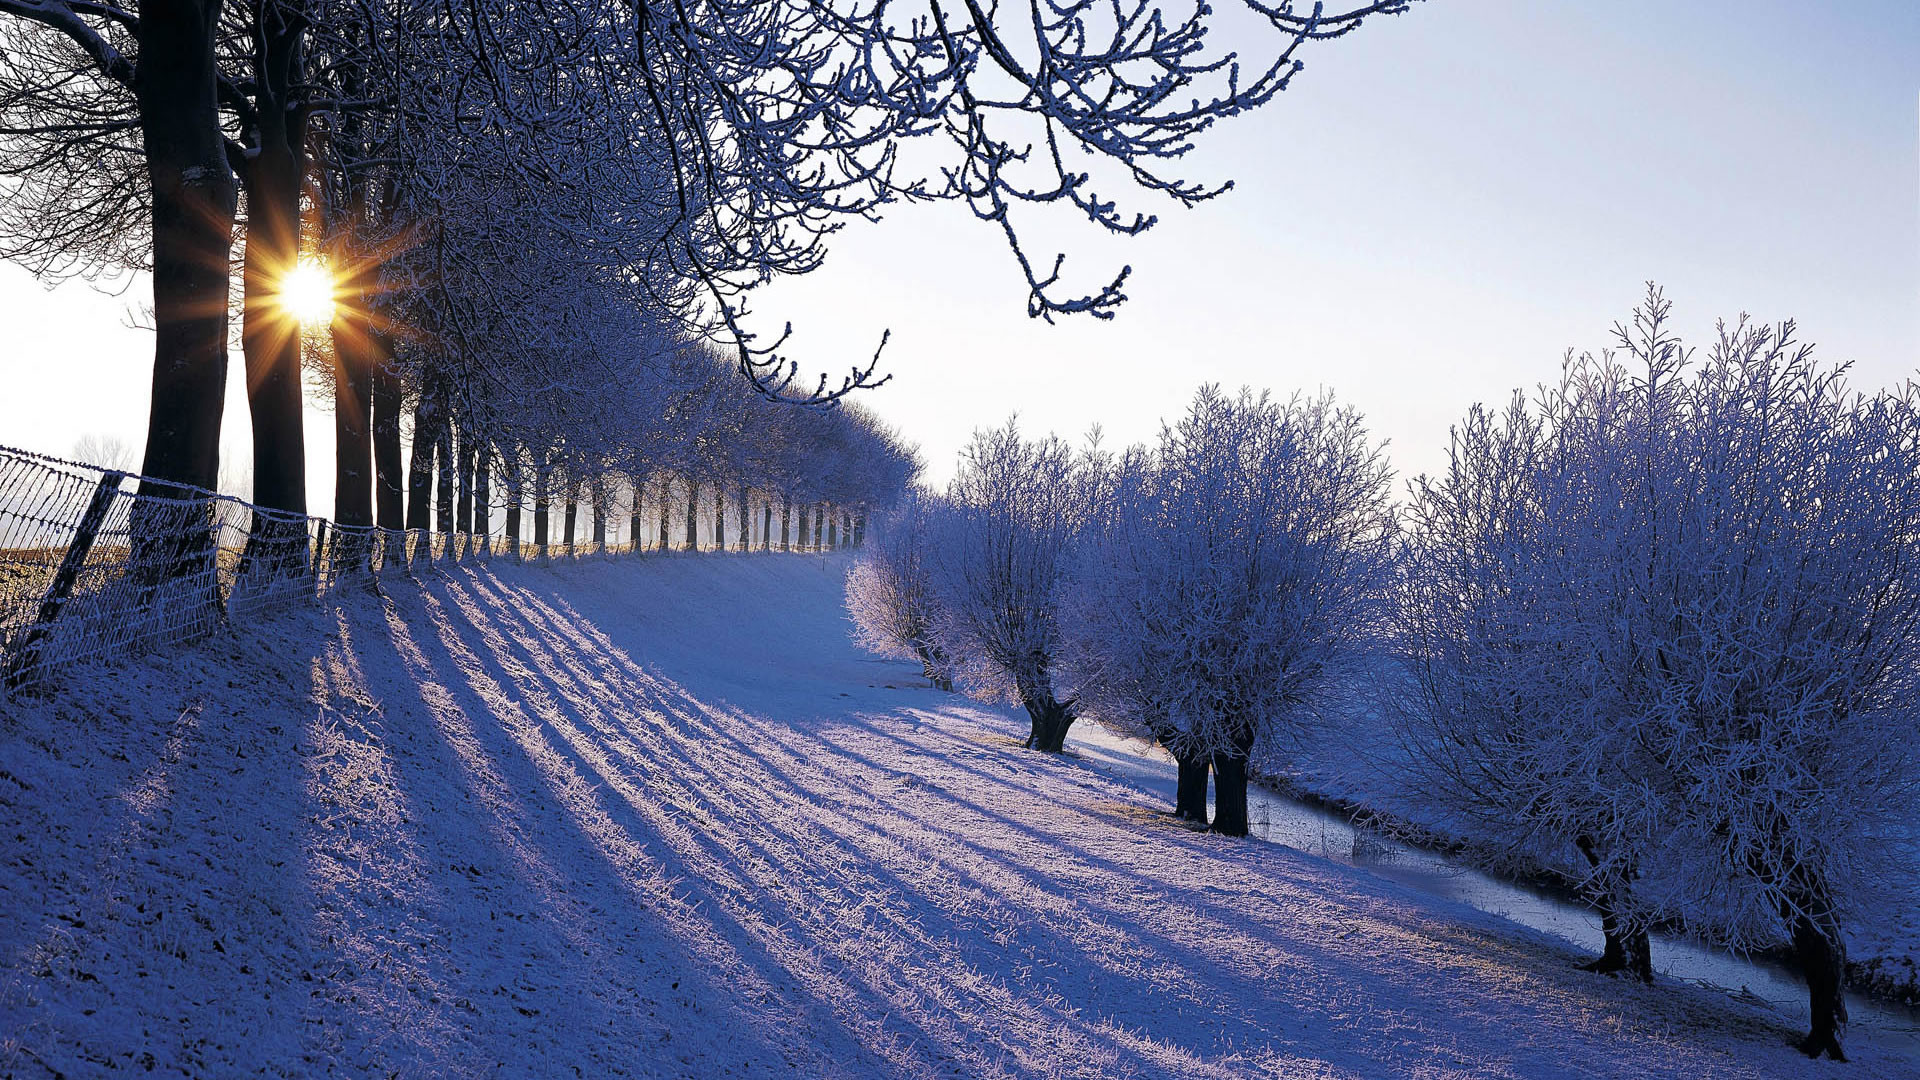 free desktop wallpaper winter which is under the winter wallpapers .